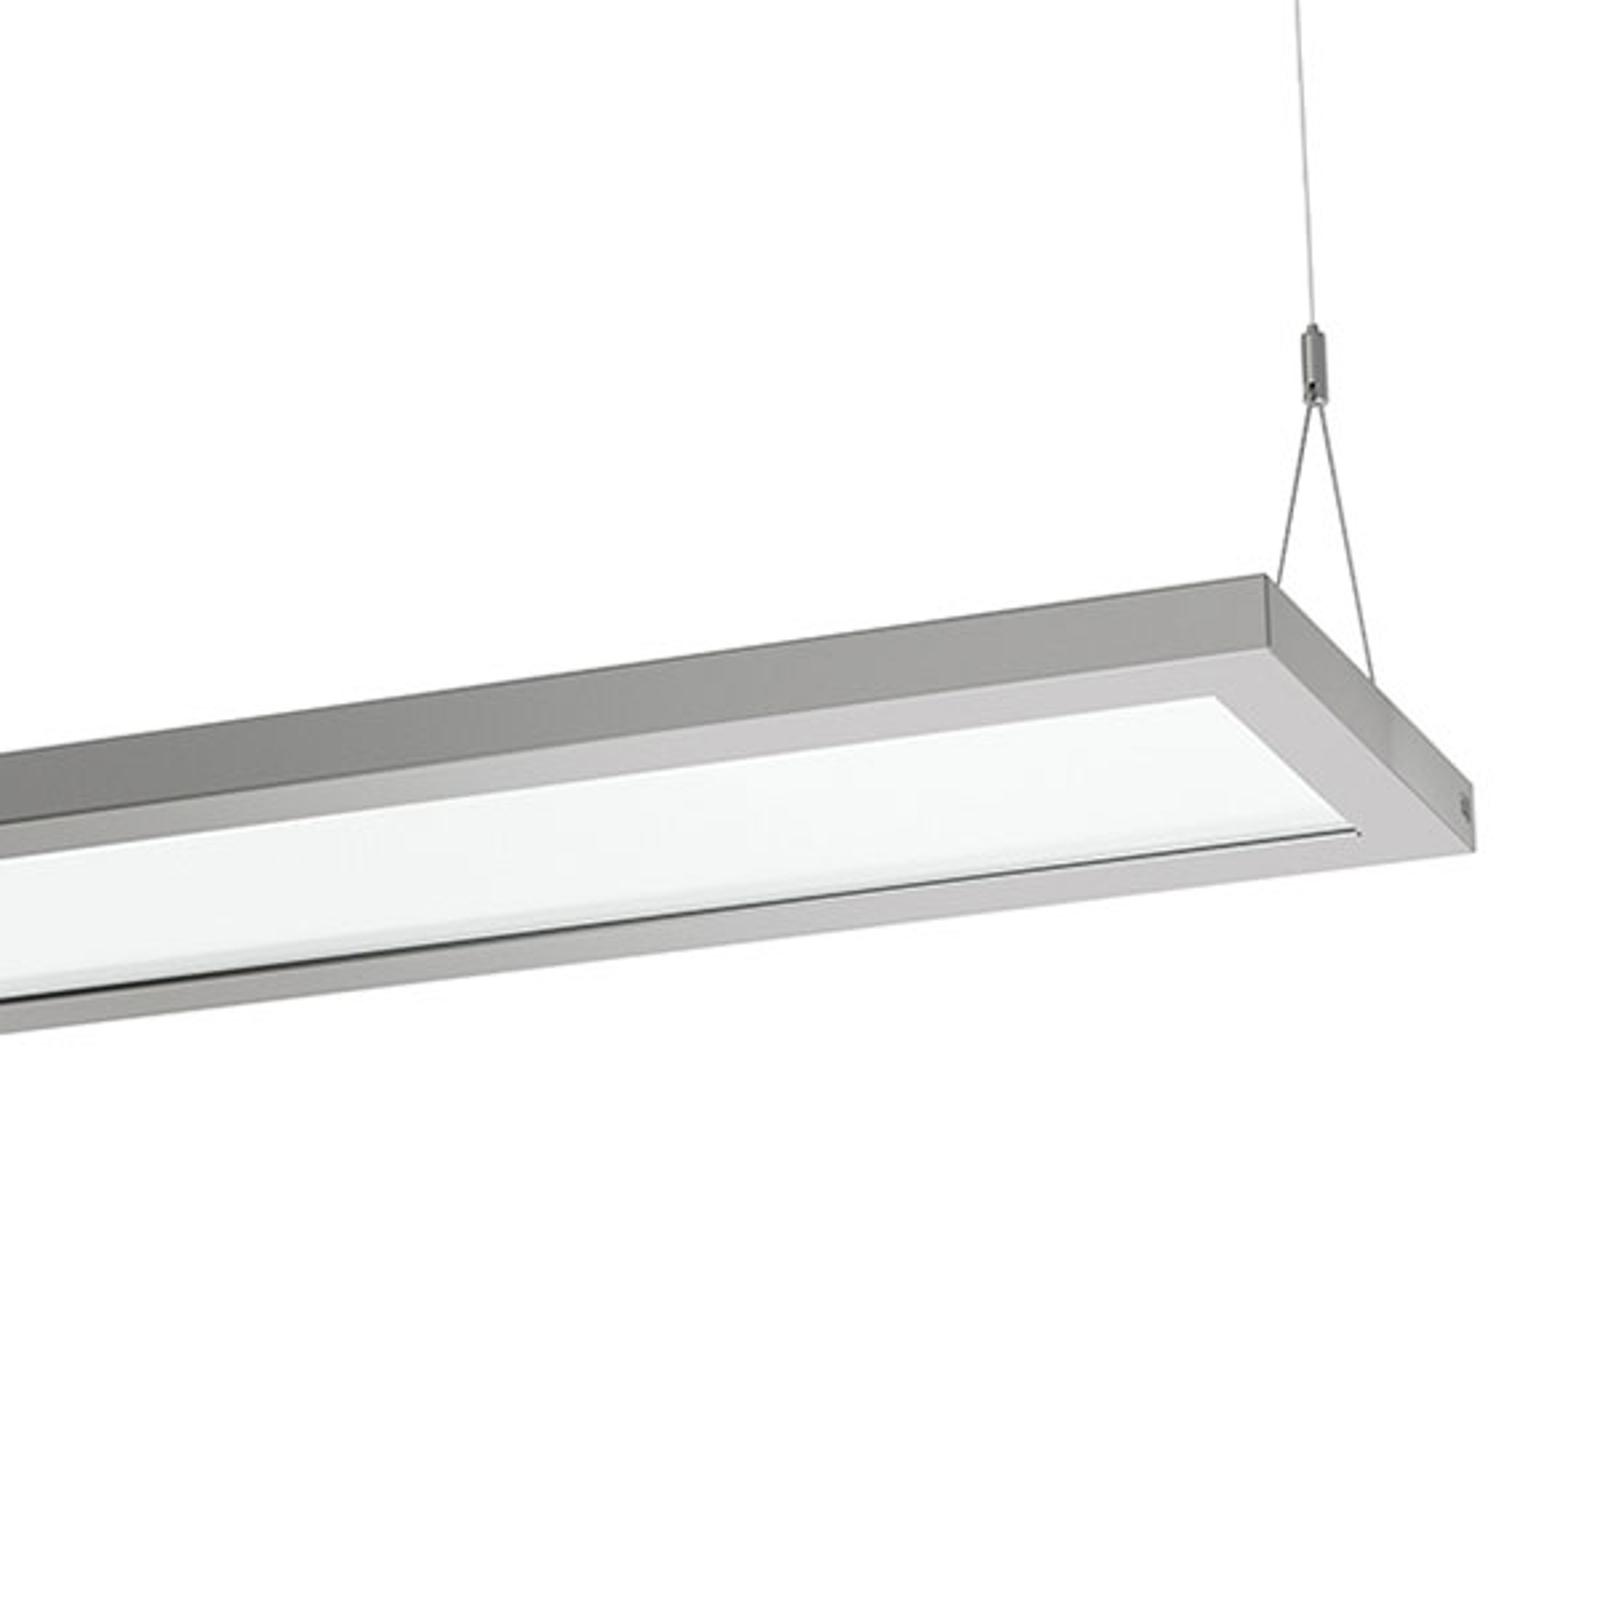 Lampa wisząca SL629PL 124 szara 4000K